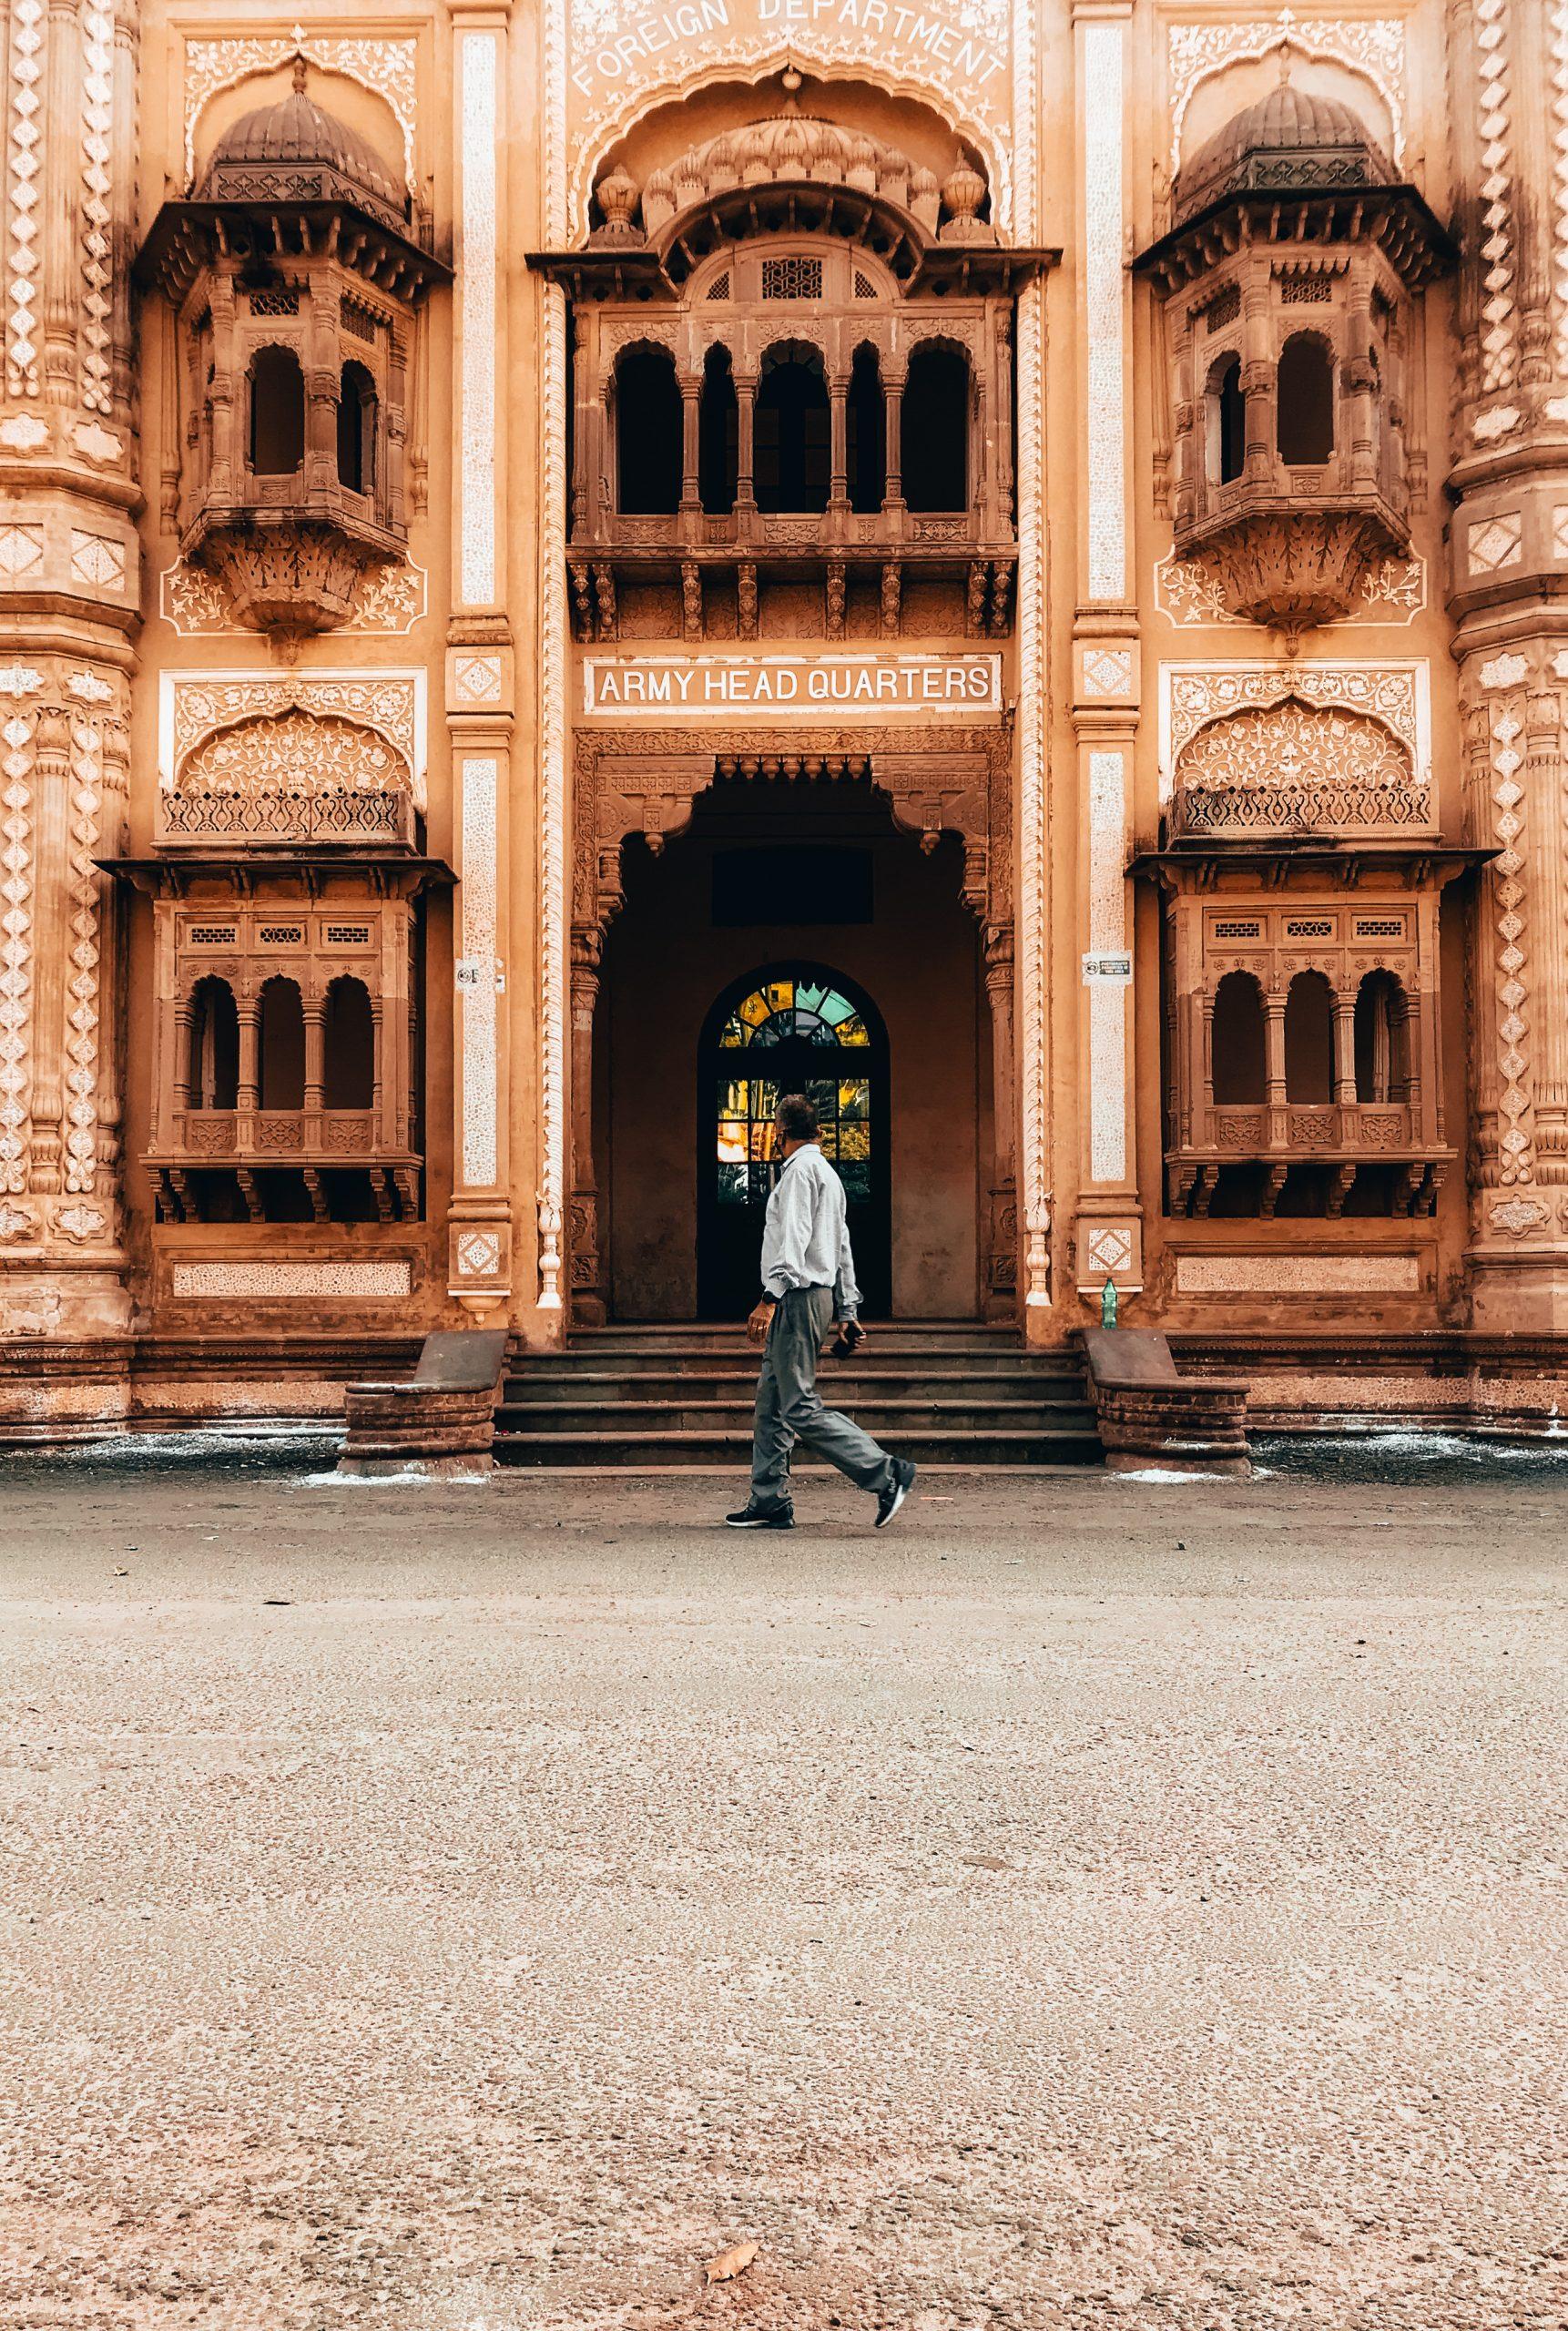 A tourist passing through a historic place